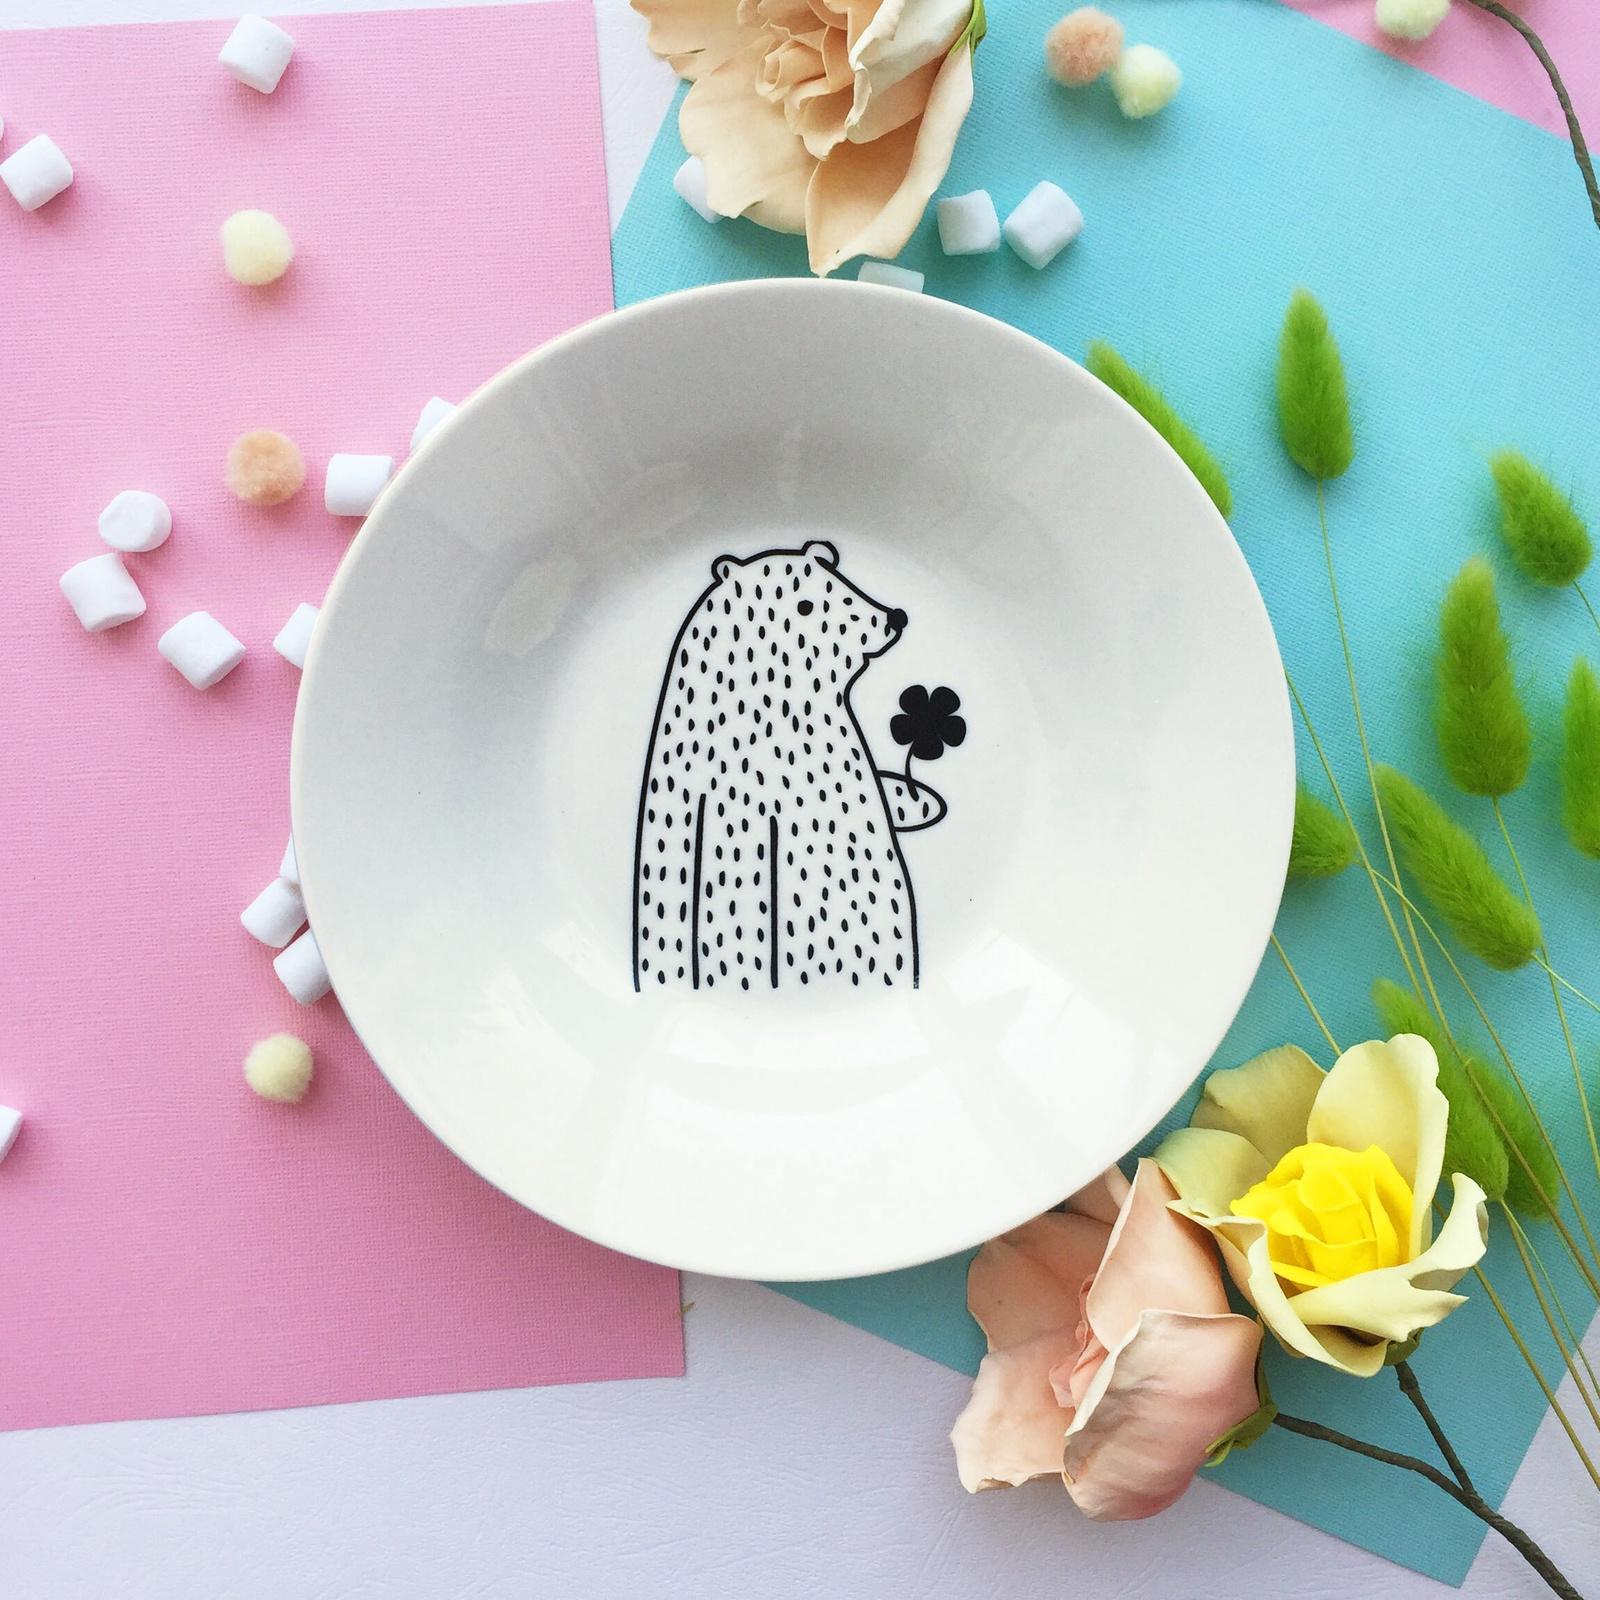 Тарелка глубокая Сотвори Чудо Цветочный мишка 20 см, белый тарелка мелкая сотвори чудо бантик sans brides диаметр 20 см